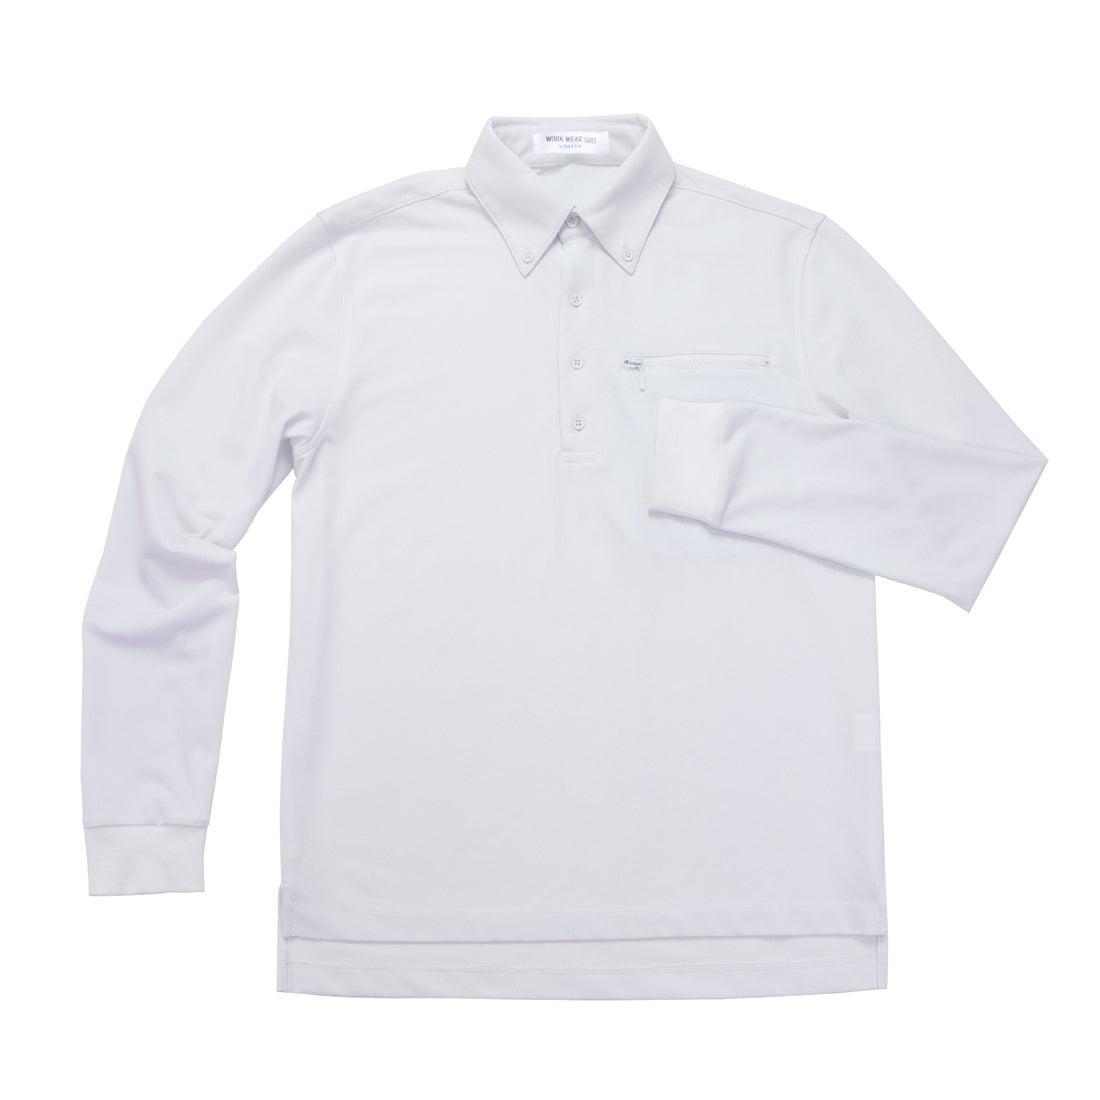 MENS 長袖ワークビズポロシャツ(ホワイト)